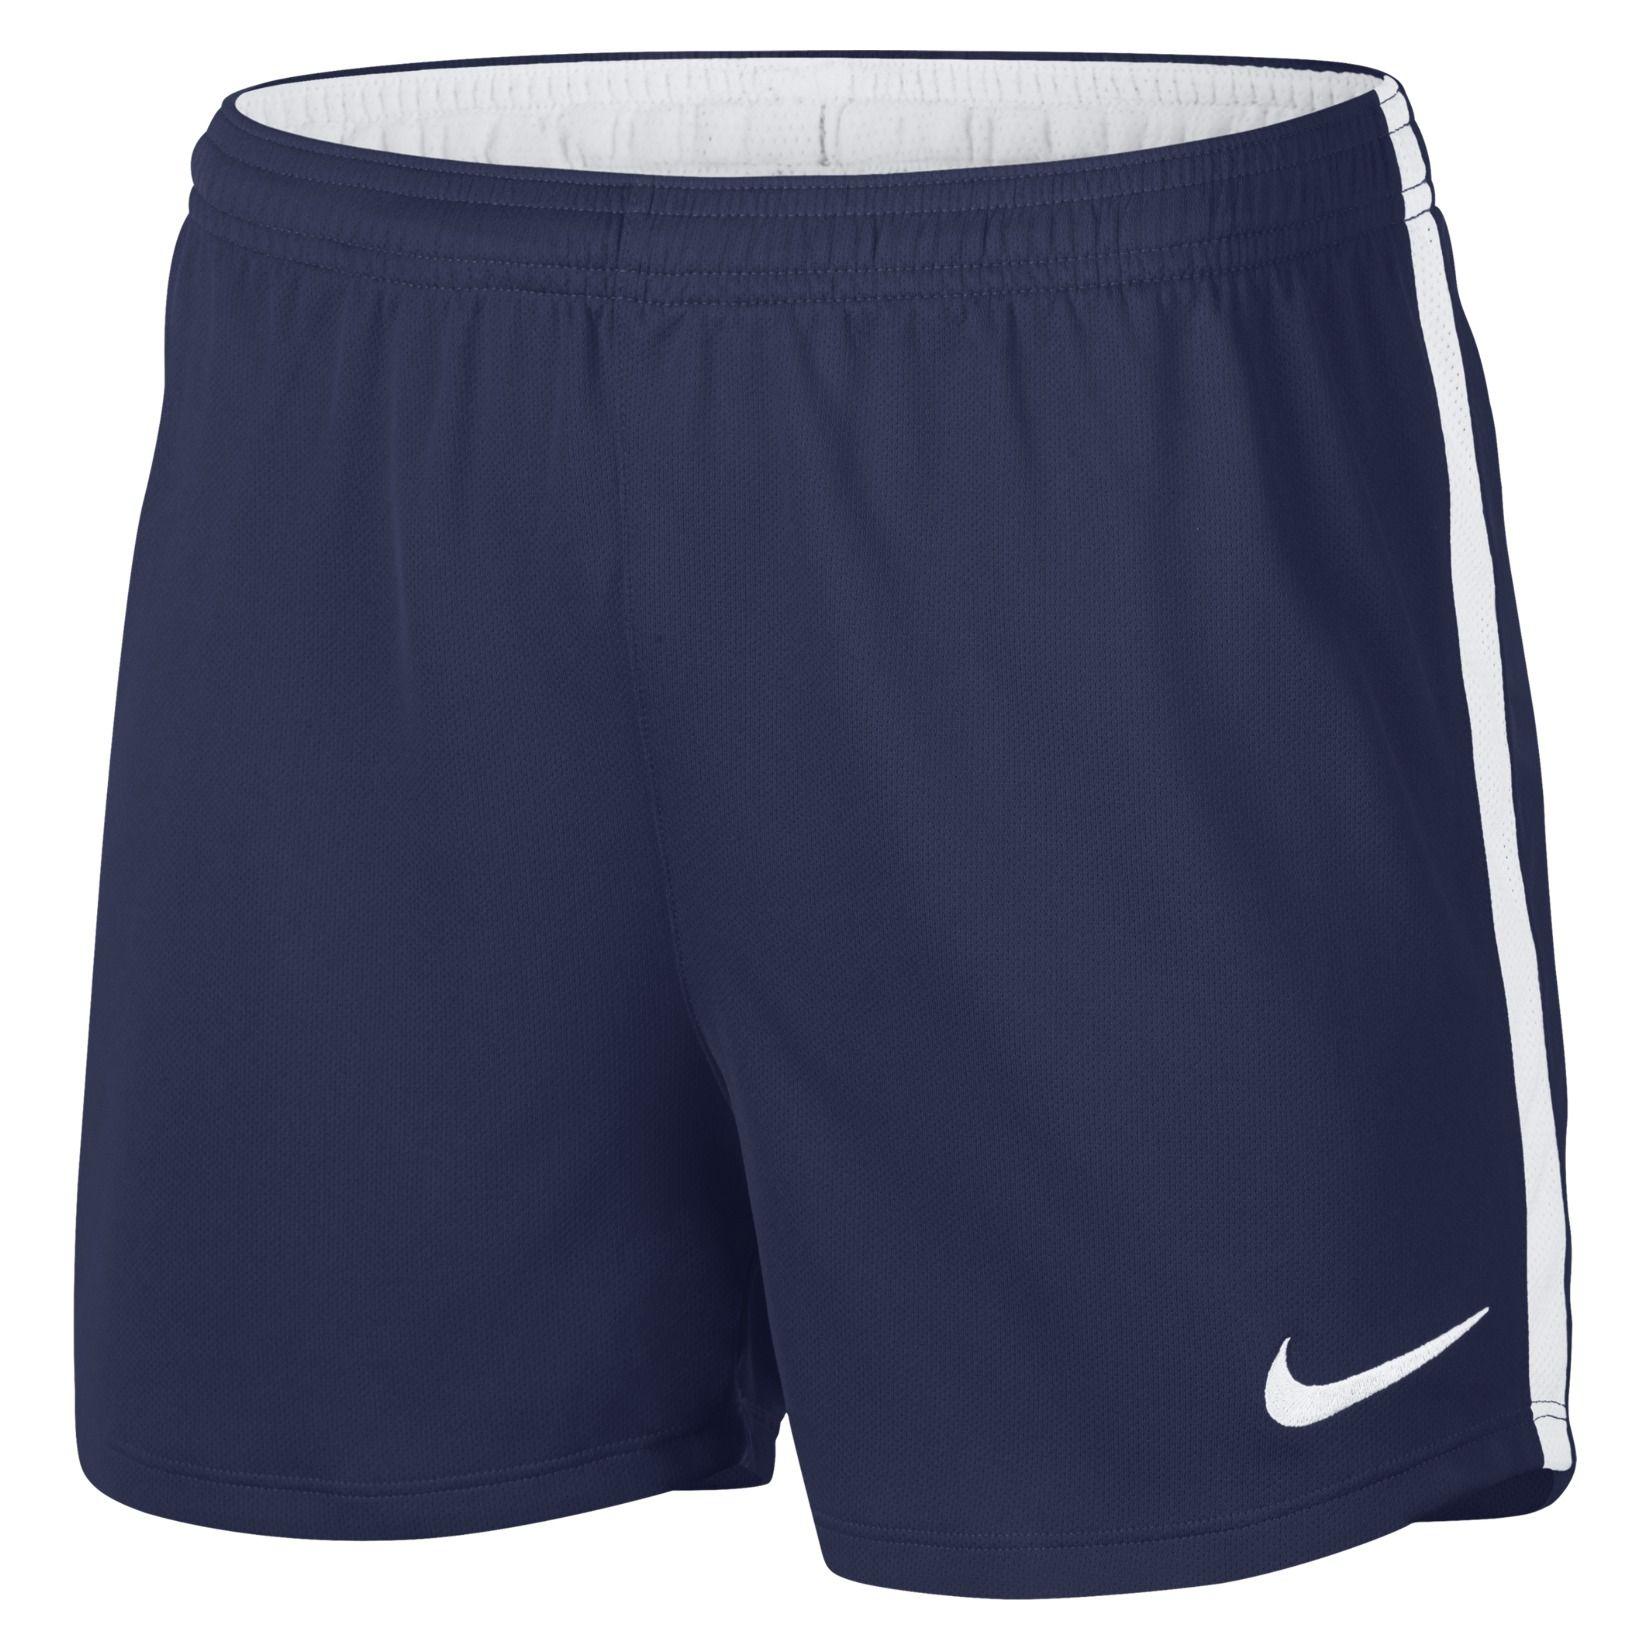 Nike Womens Academy Shorts for £12.92 delivered @ kitlocker.com